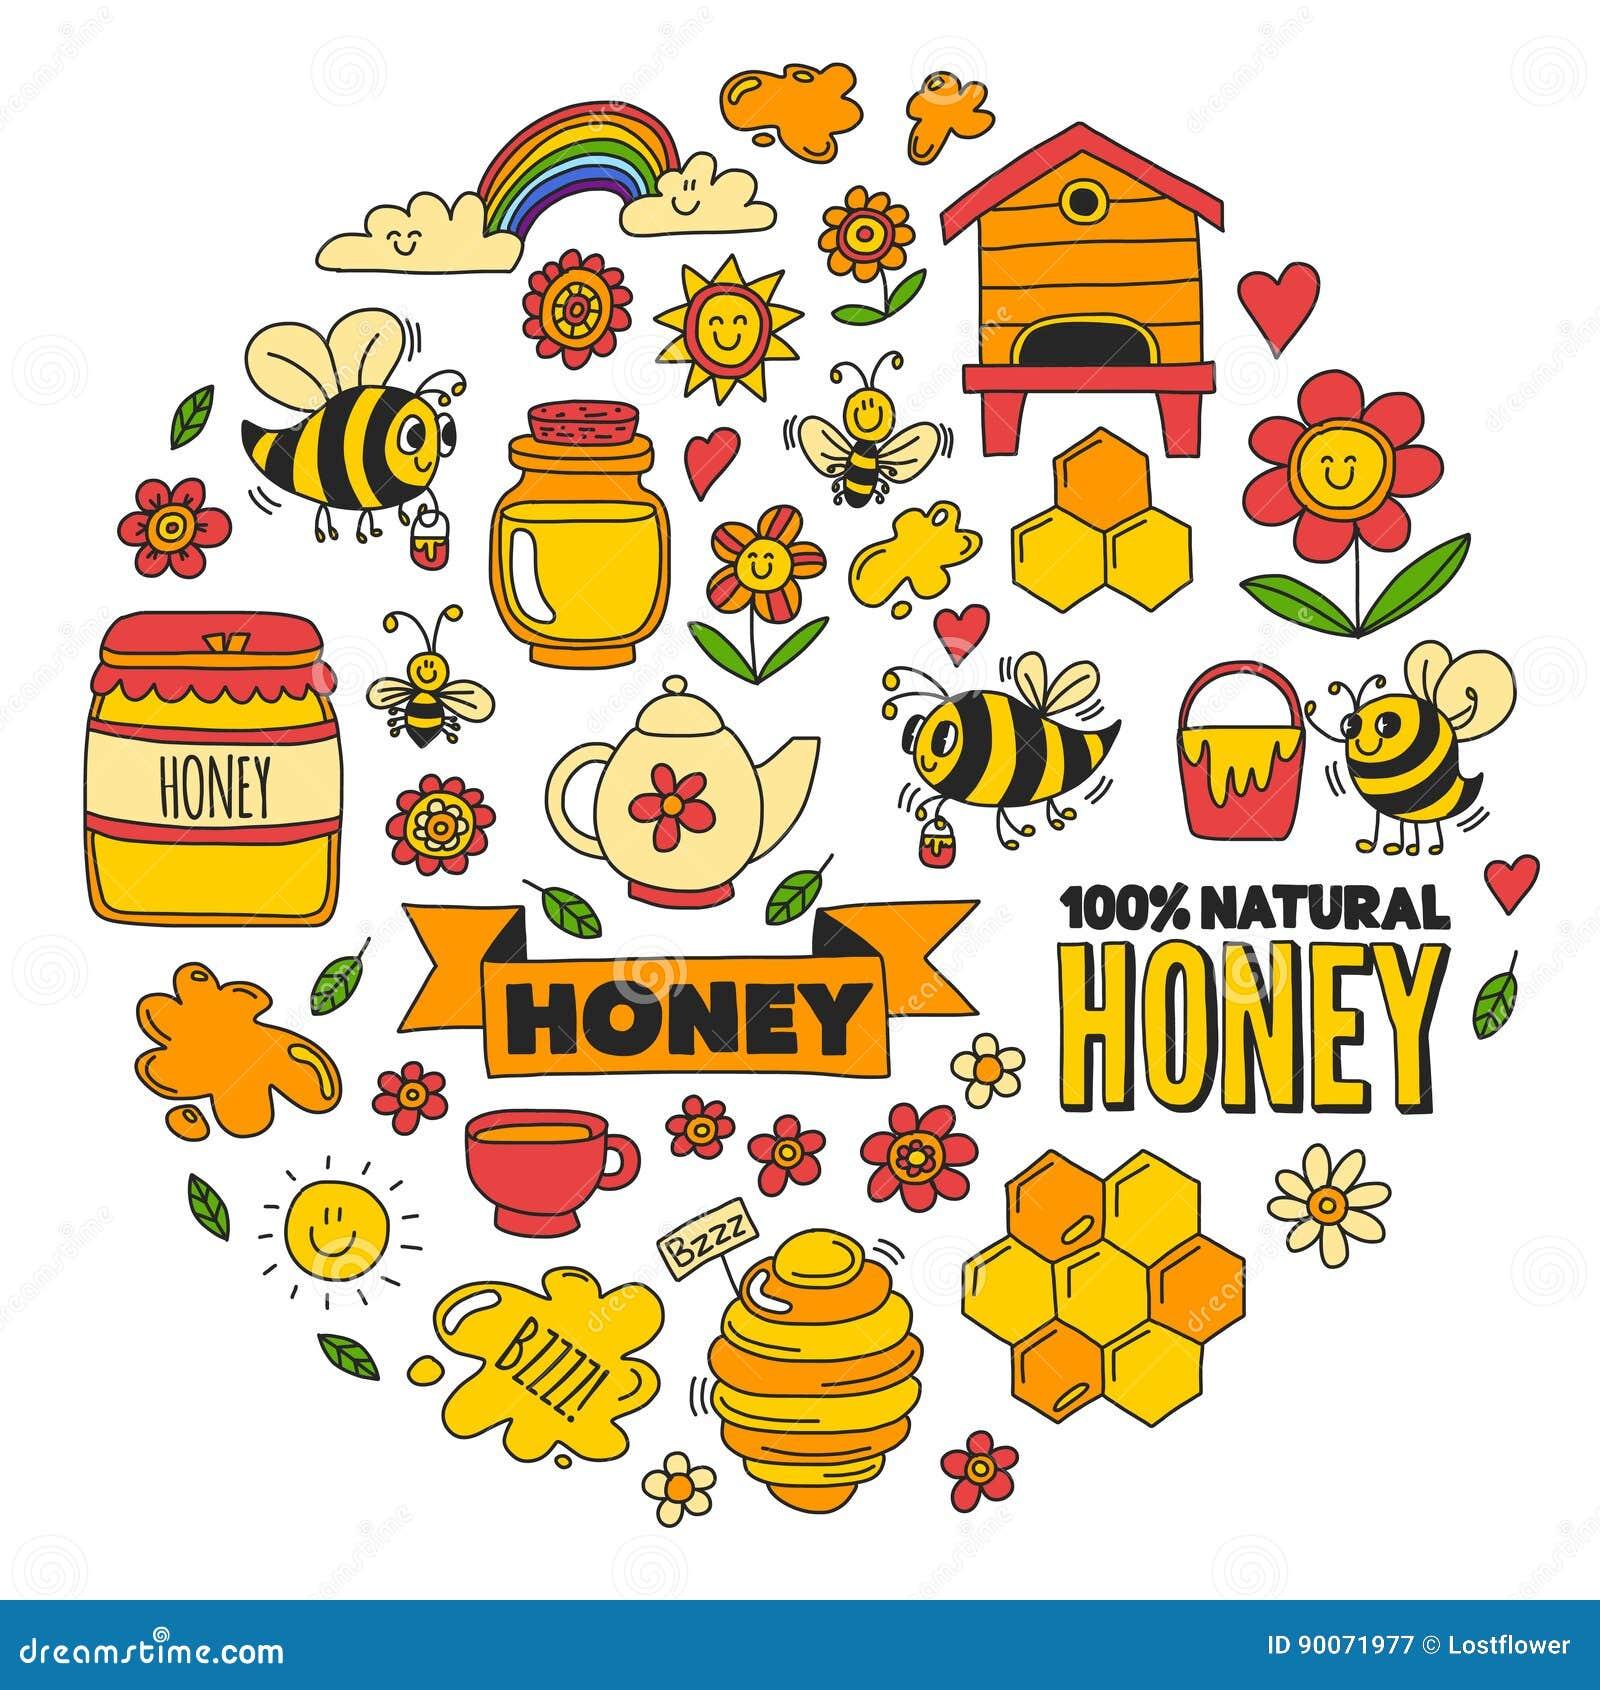 Honey market, bazaar, honey fair Doodle images of bees, flowers, jars, honeycomb, beehive, spot, the keg with lettering